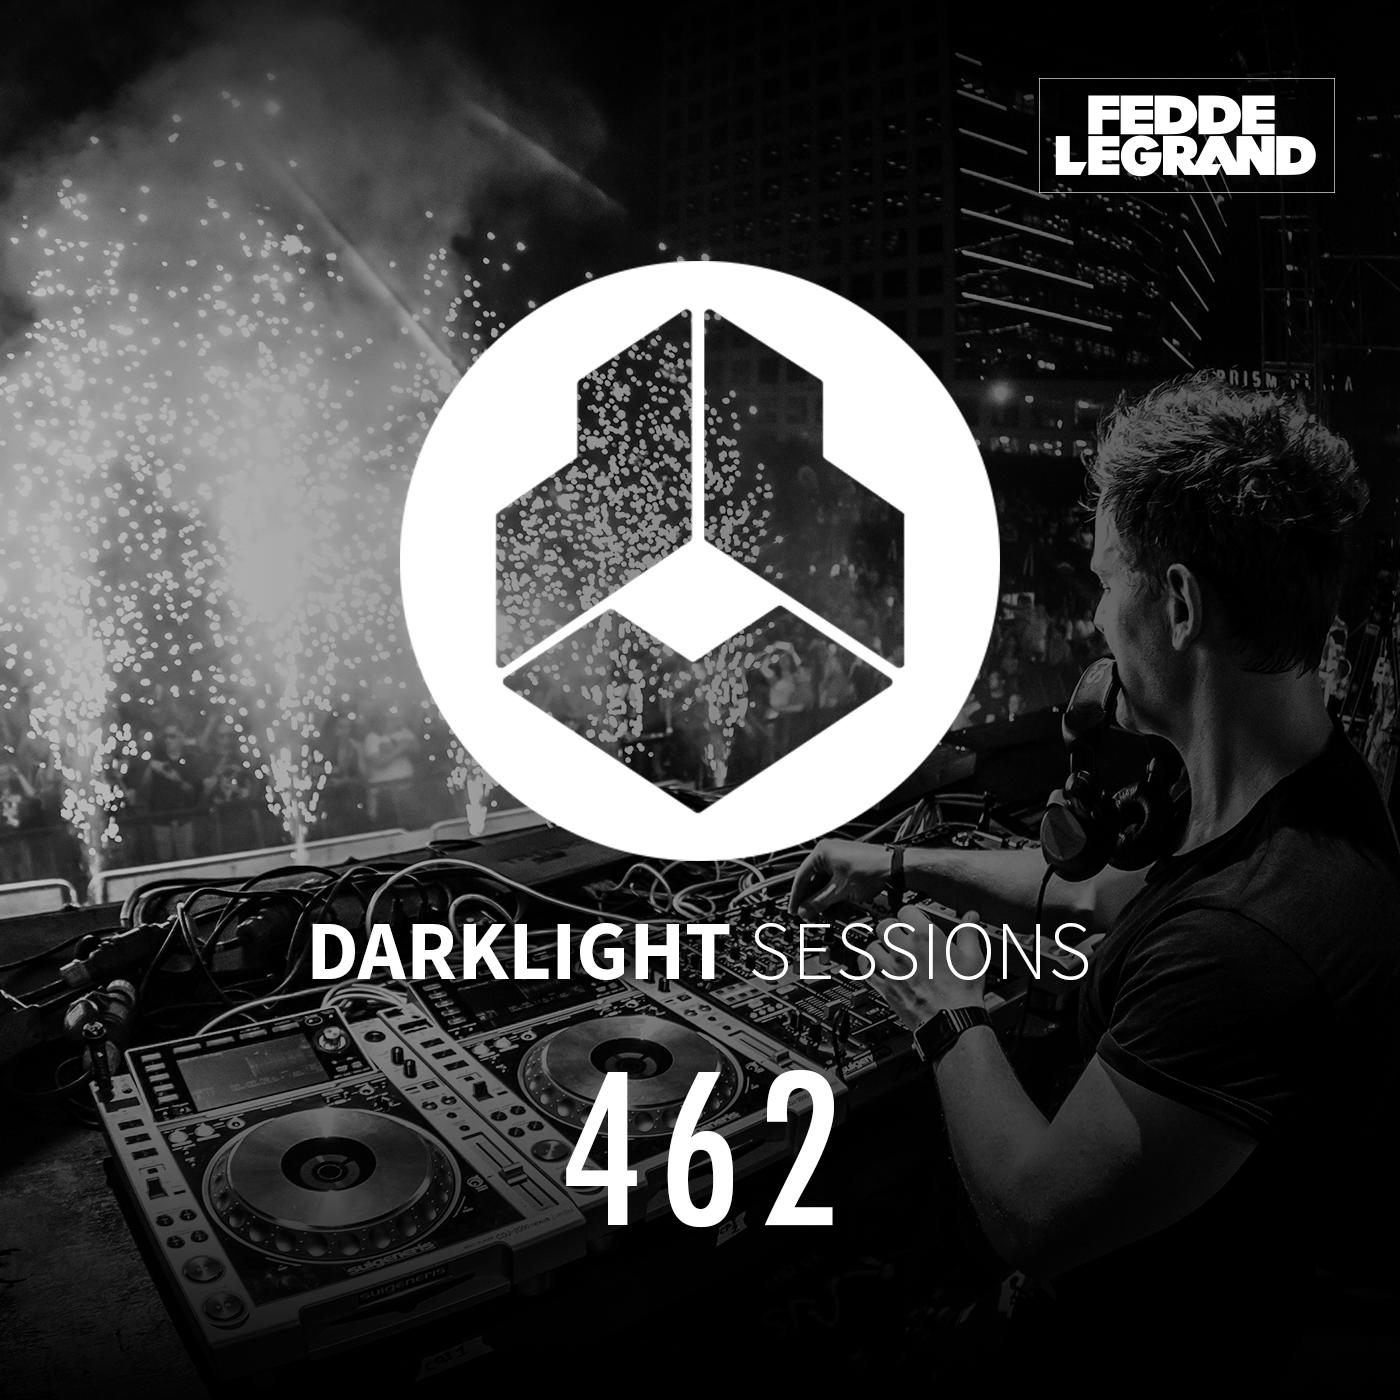 Darklight Sessions 462